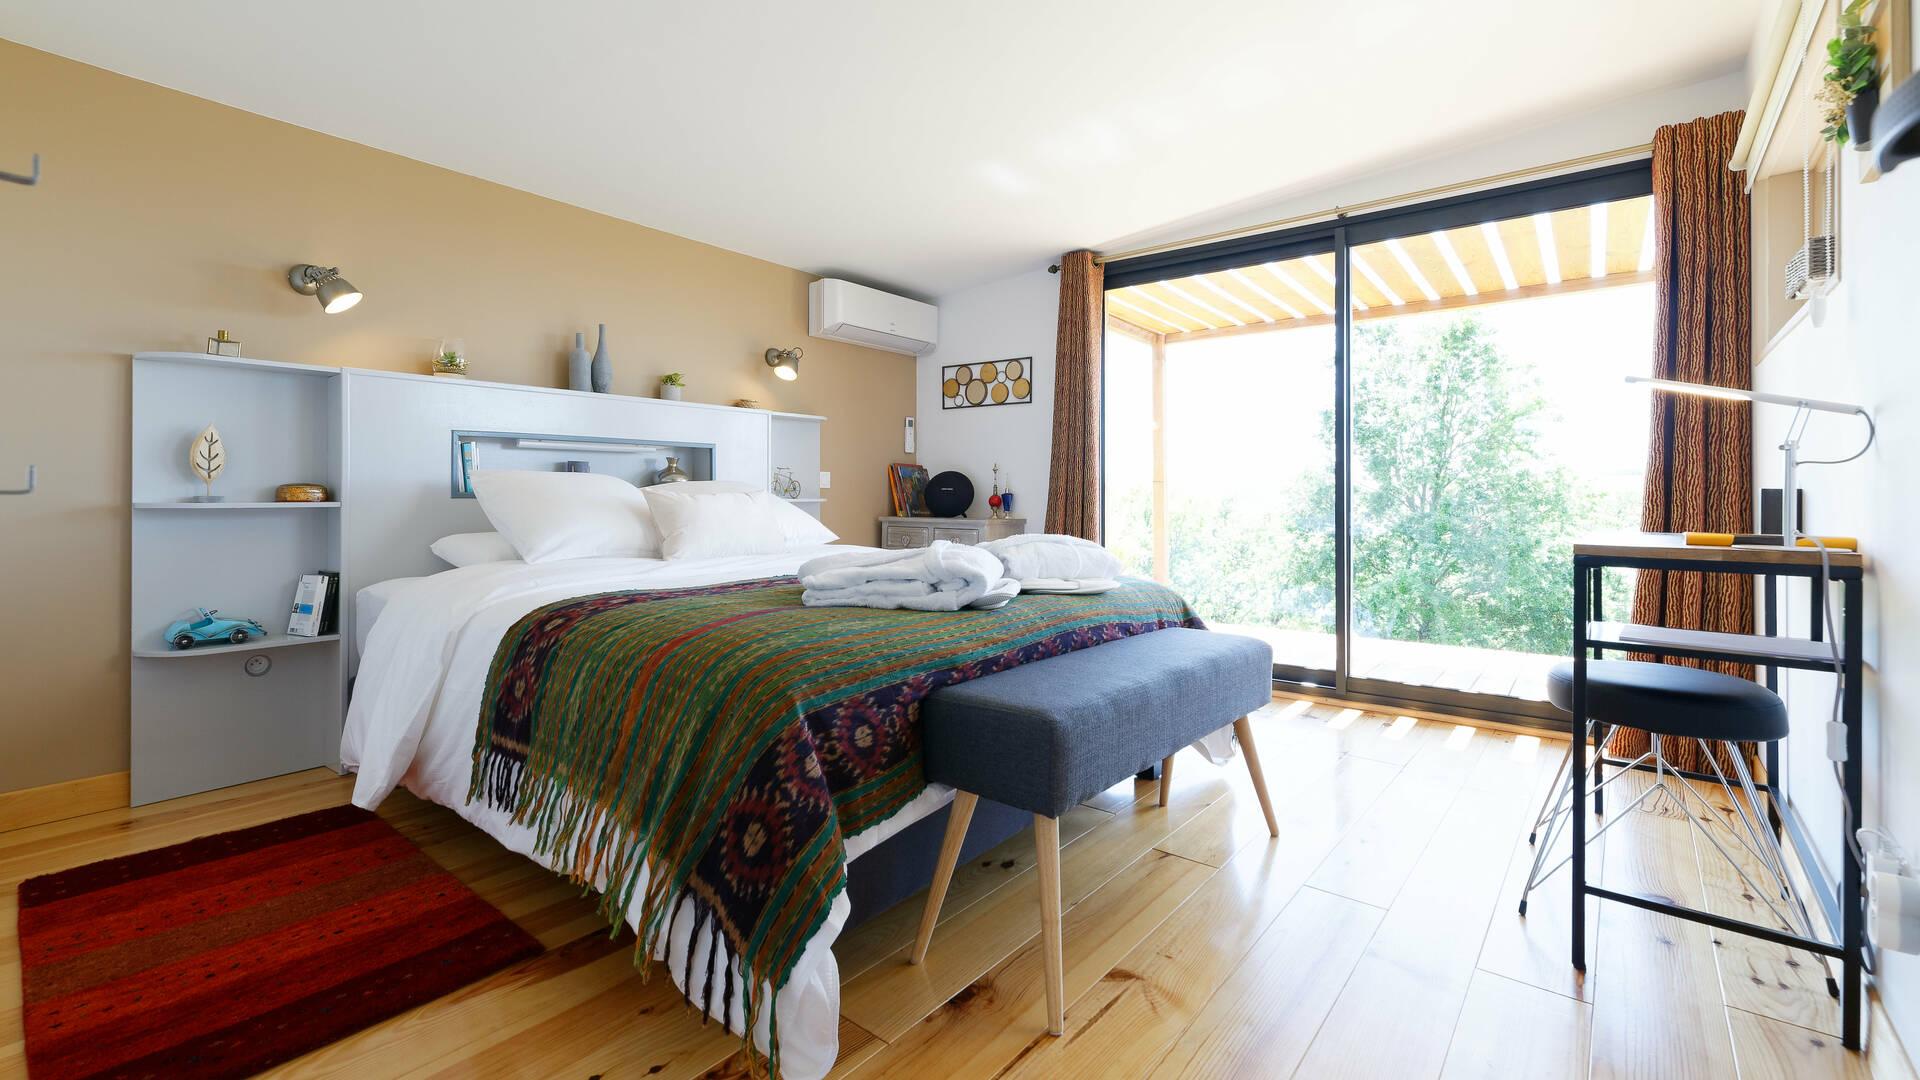 Bedroom, B&B Saga, Savignac-Mona, Lombez, Samatan, Savès, Gers, Gascogne, France